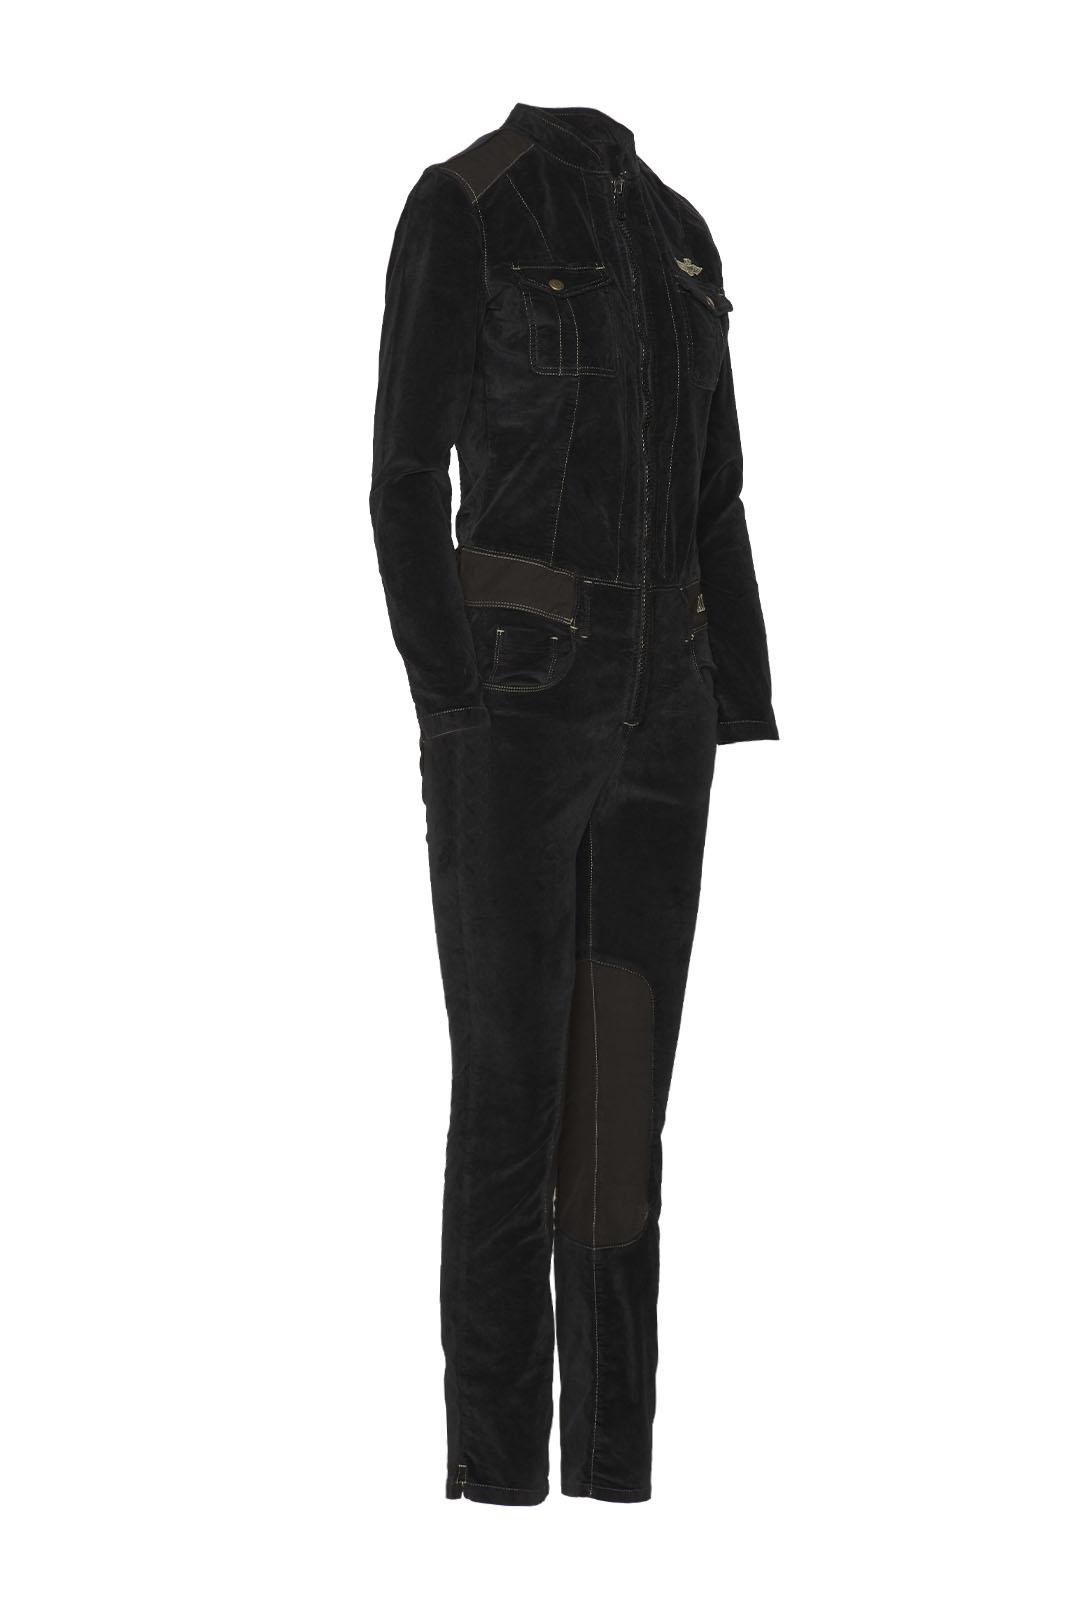 Anzug aus Samt                           3